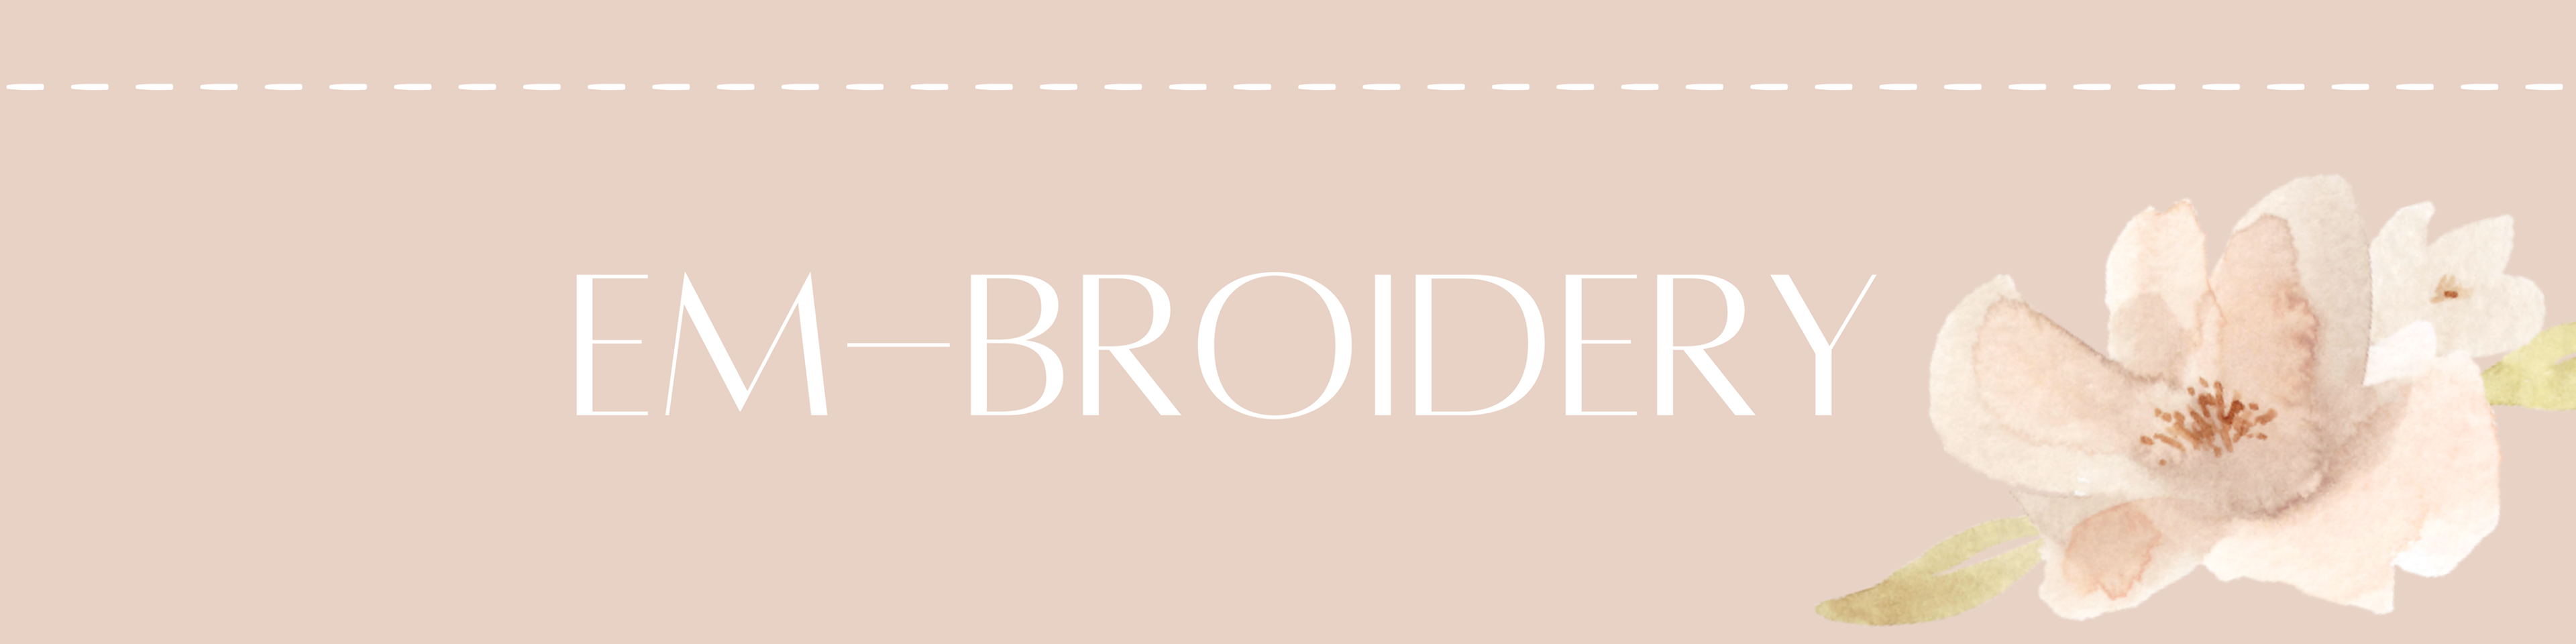 Em-broidery